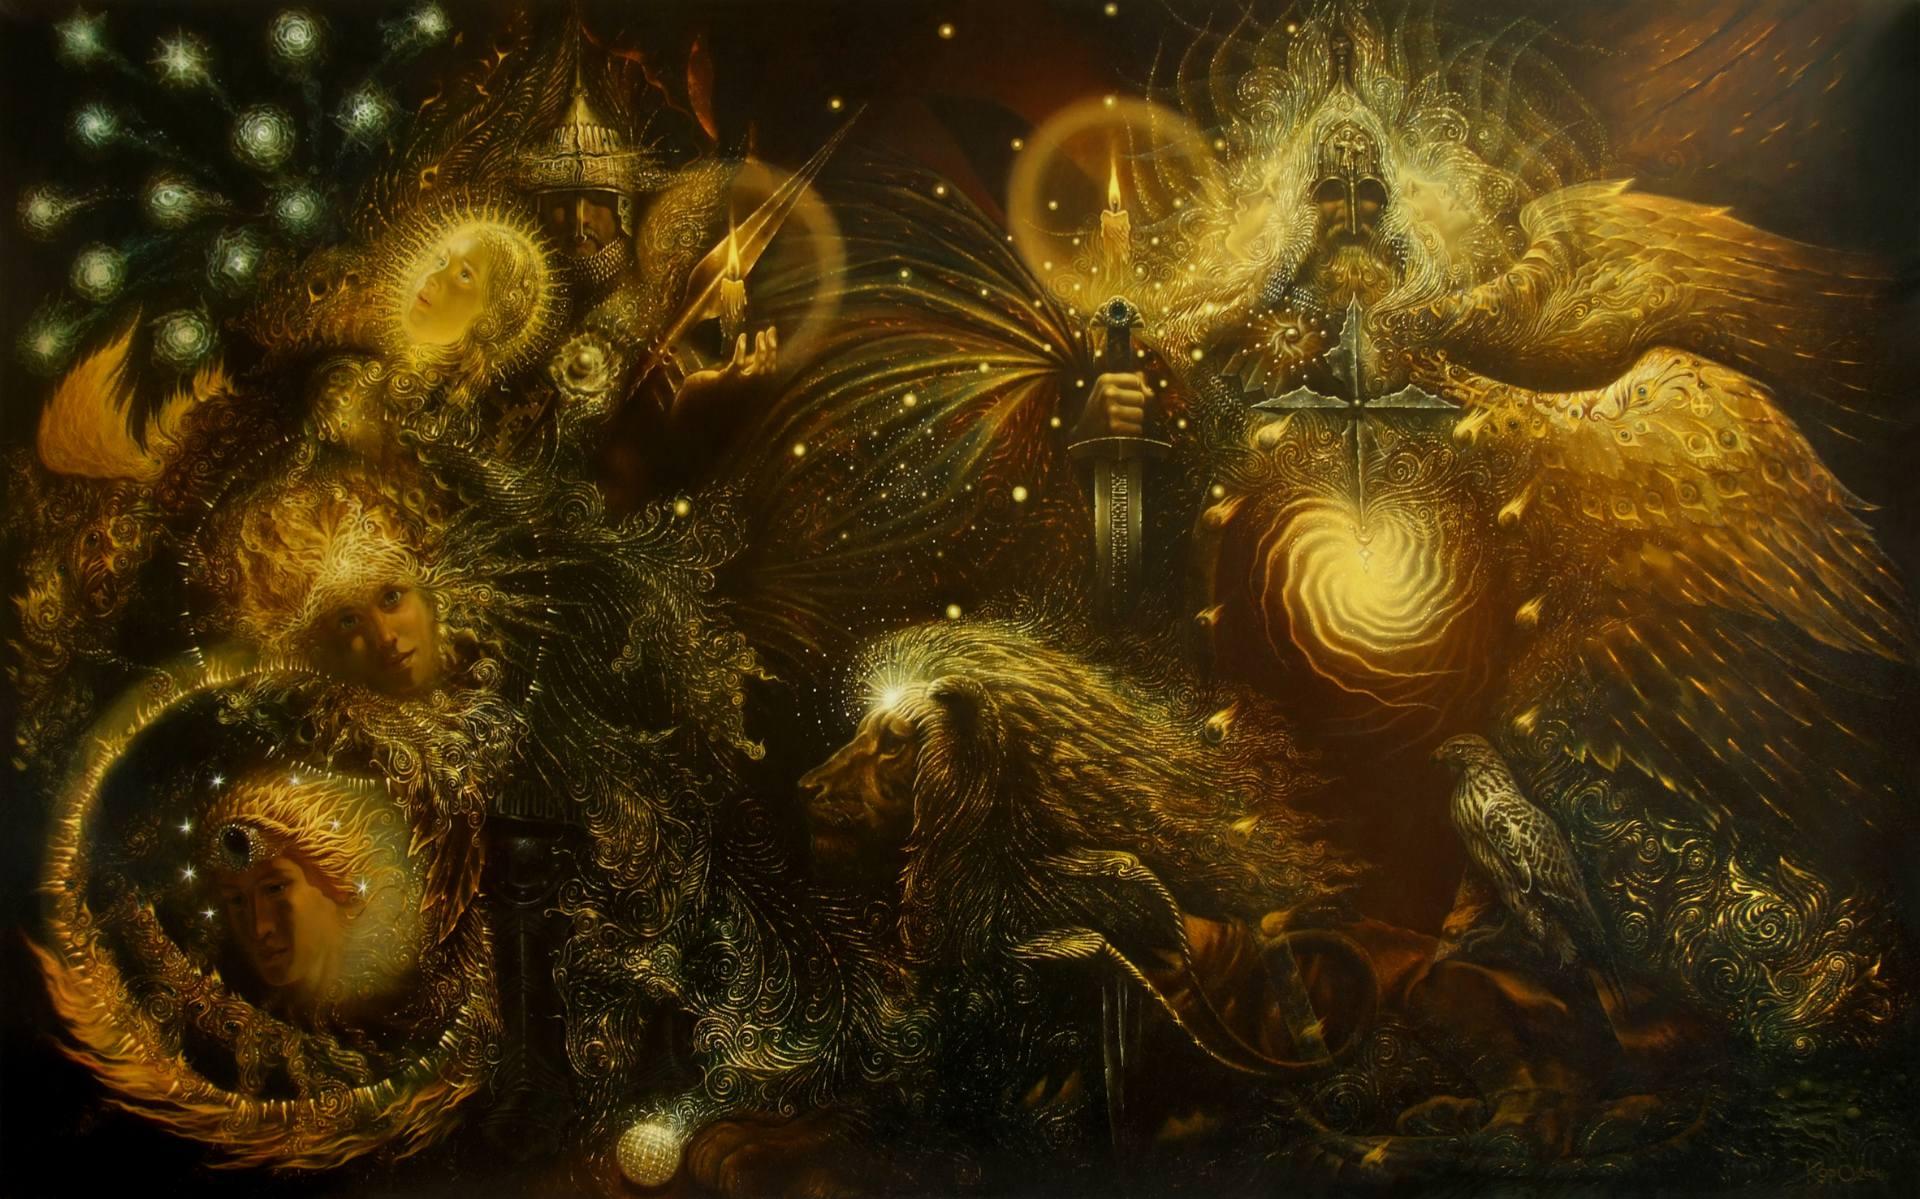 General 1920x1199 trippy psychedelic fractal Norse mythology lion